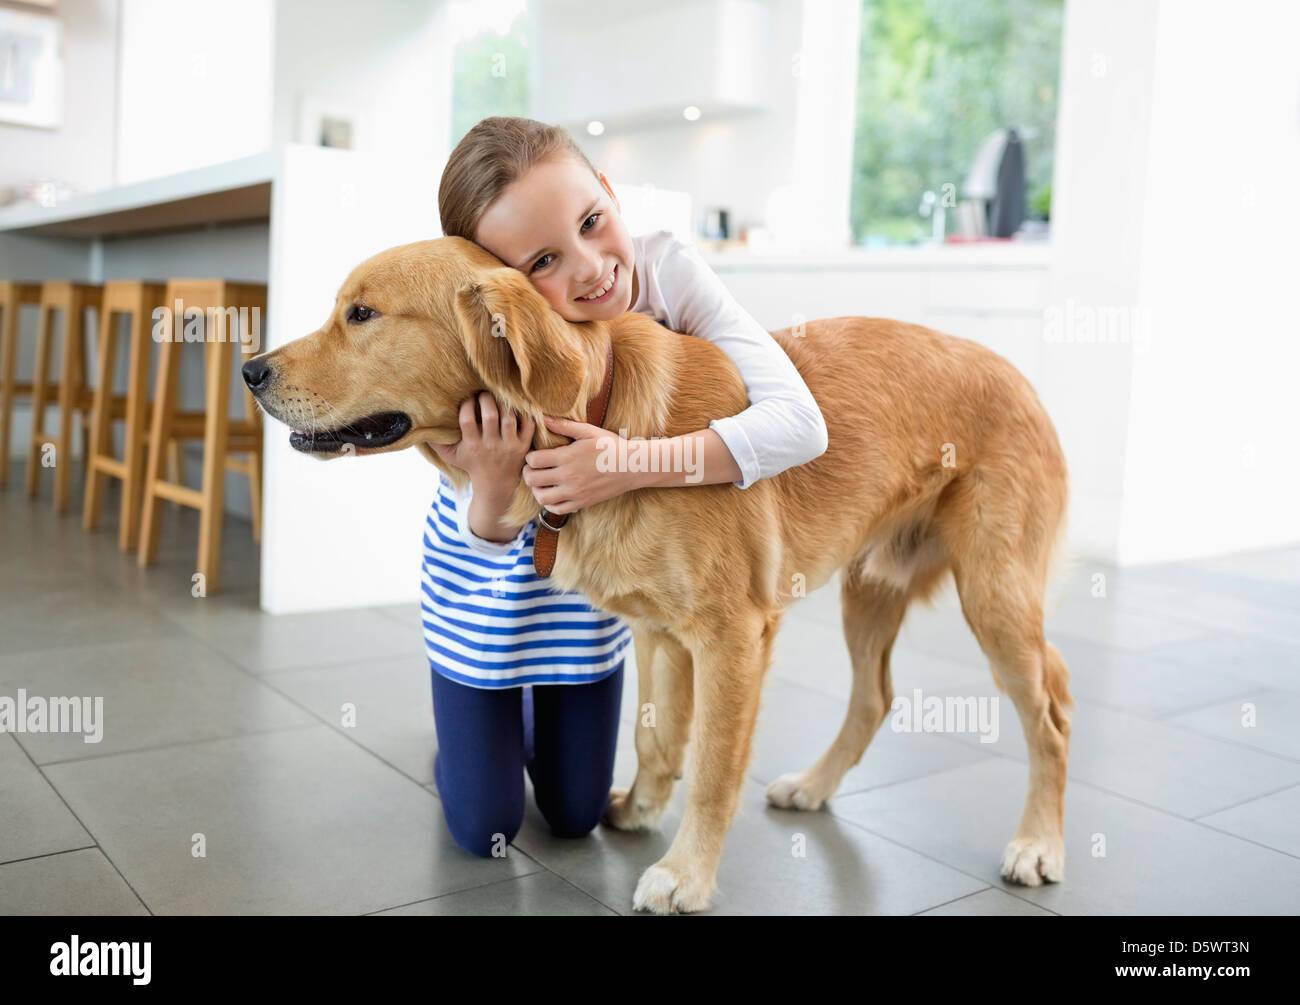 Smiling girl hugging dog in kitchen - Stock Image